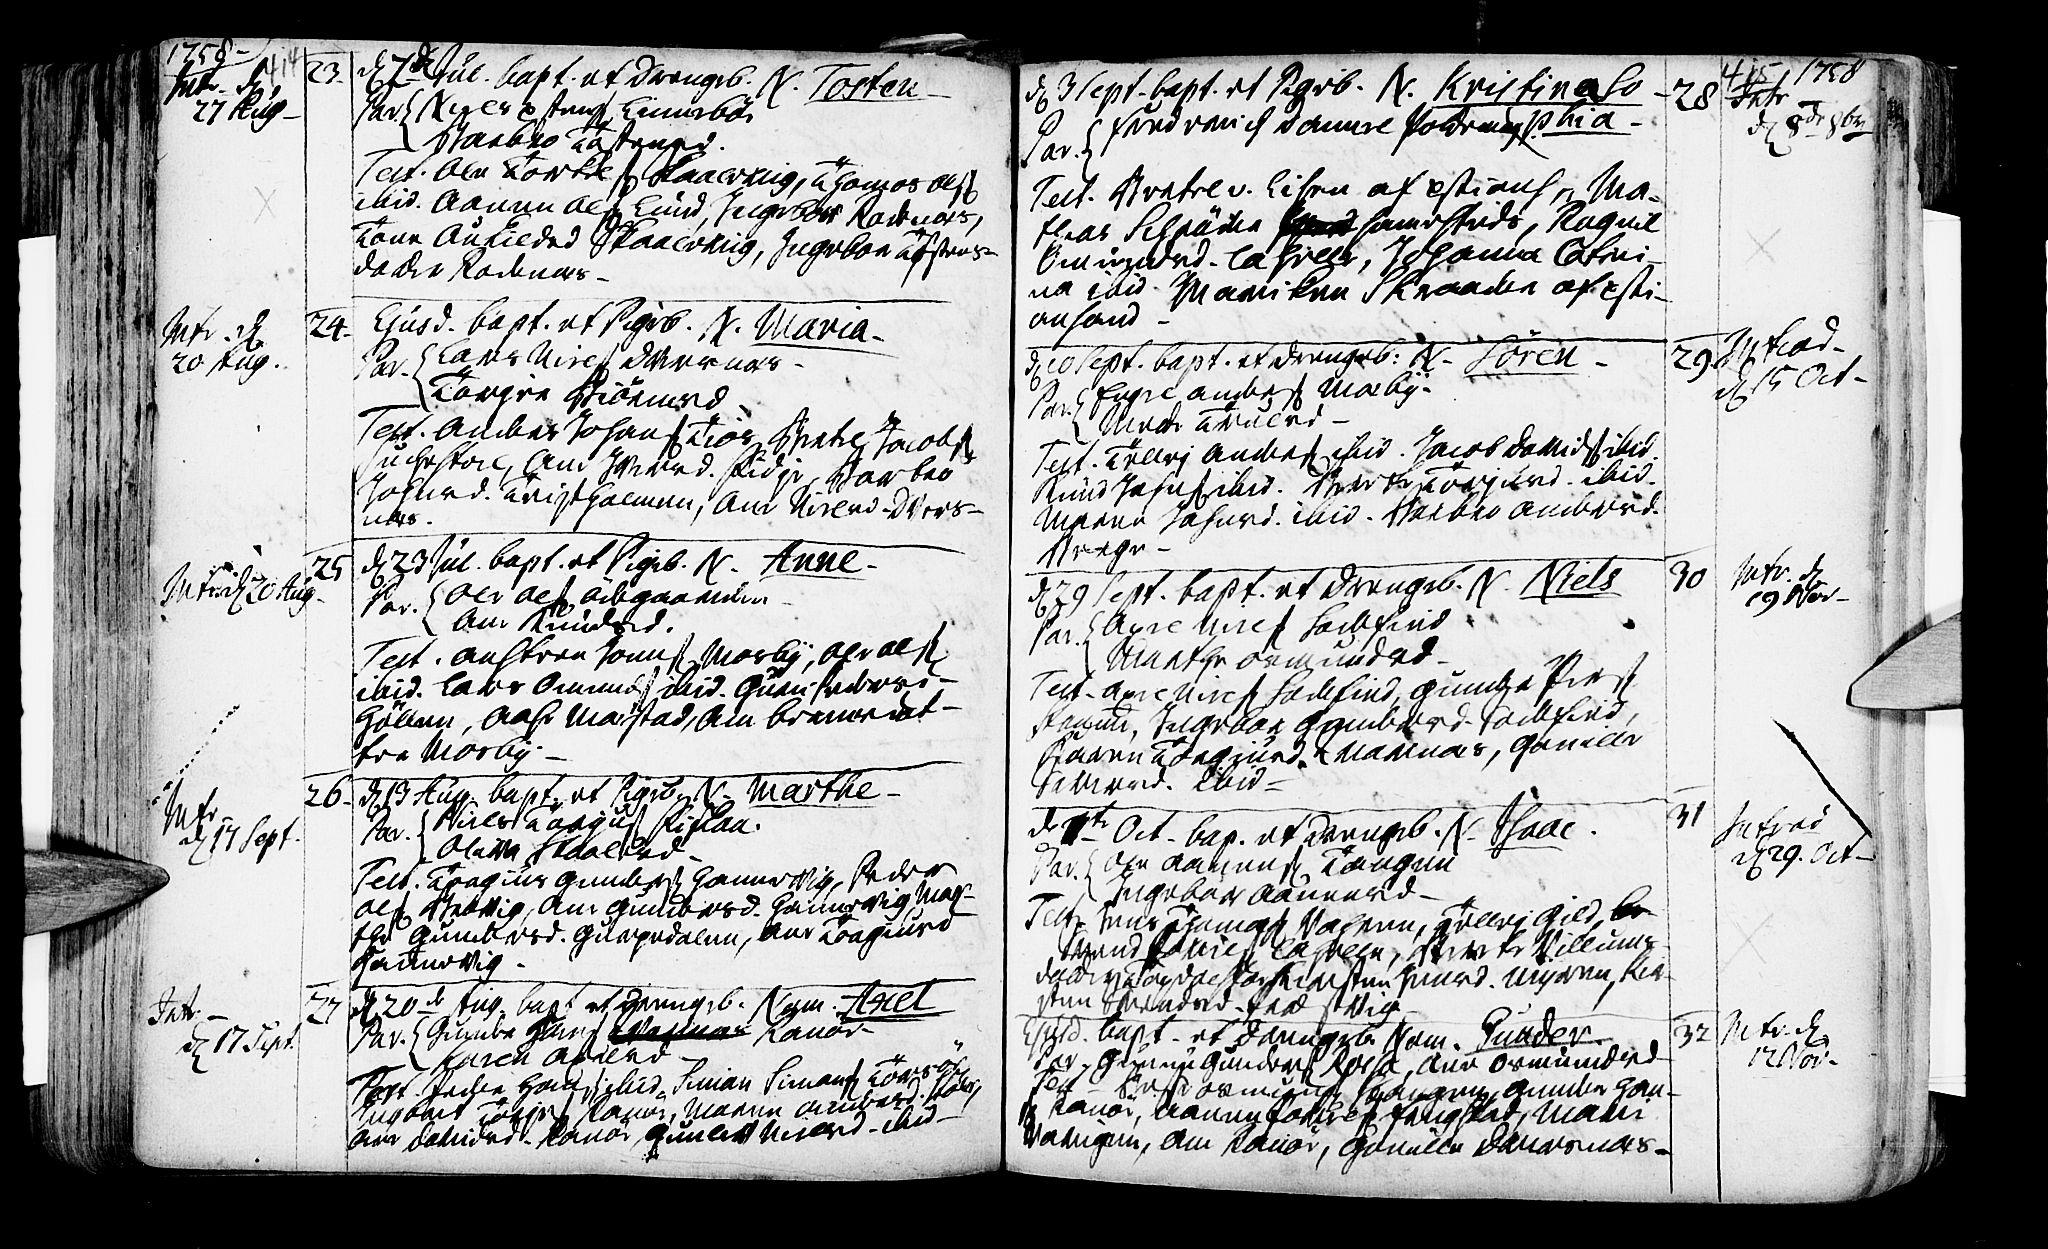 SAK, Oddernes sokneprestkontor, F/Fa/Faa/L0002: Ministerialbok nr. A 2, 1719-1764, s. 414-415